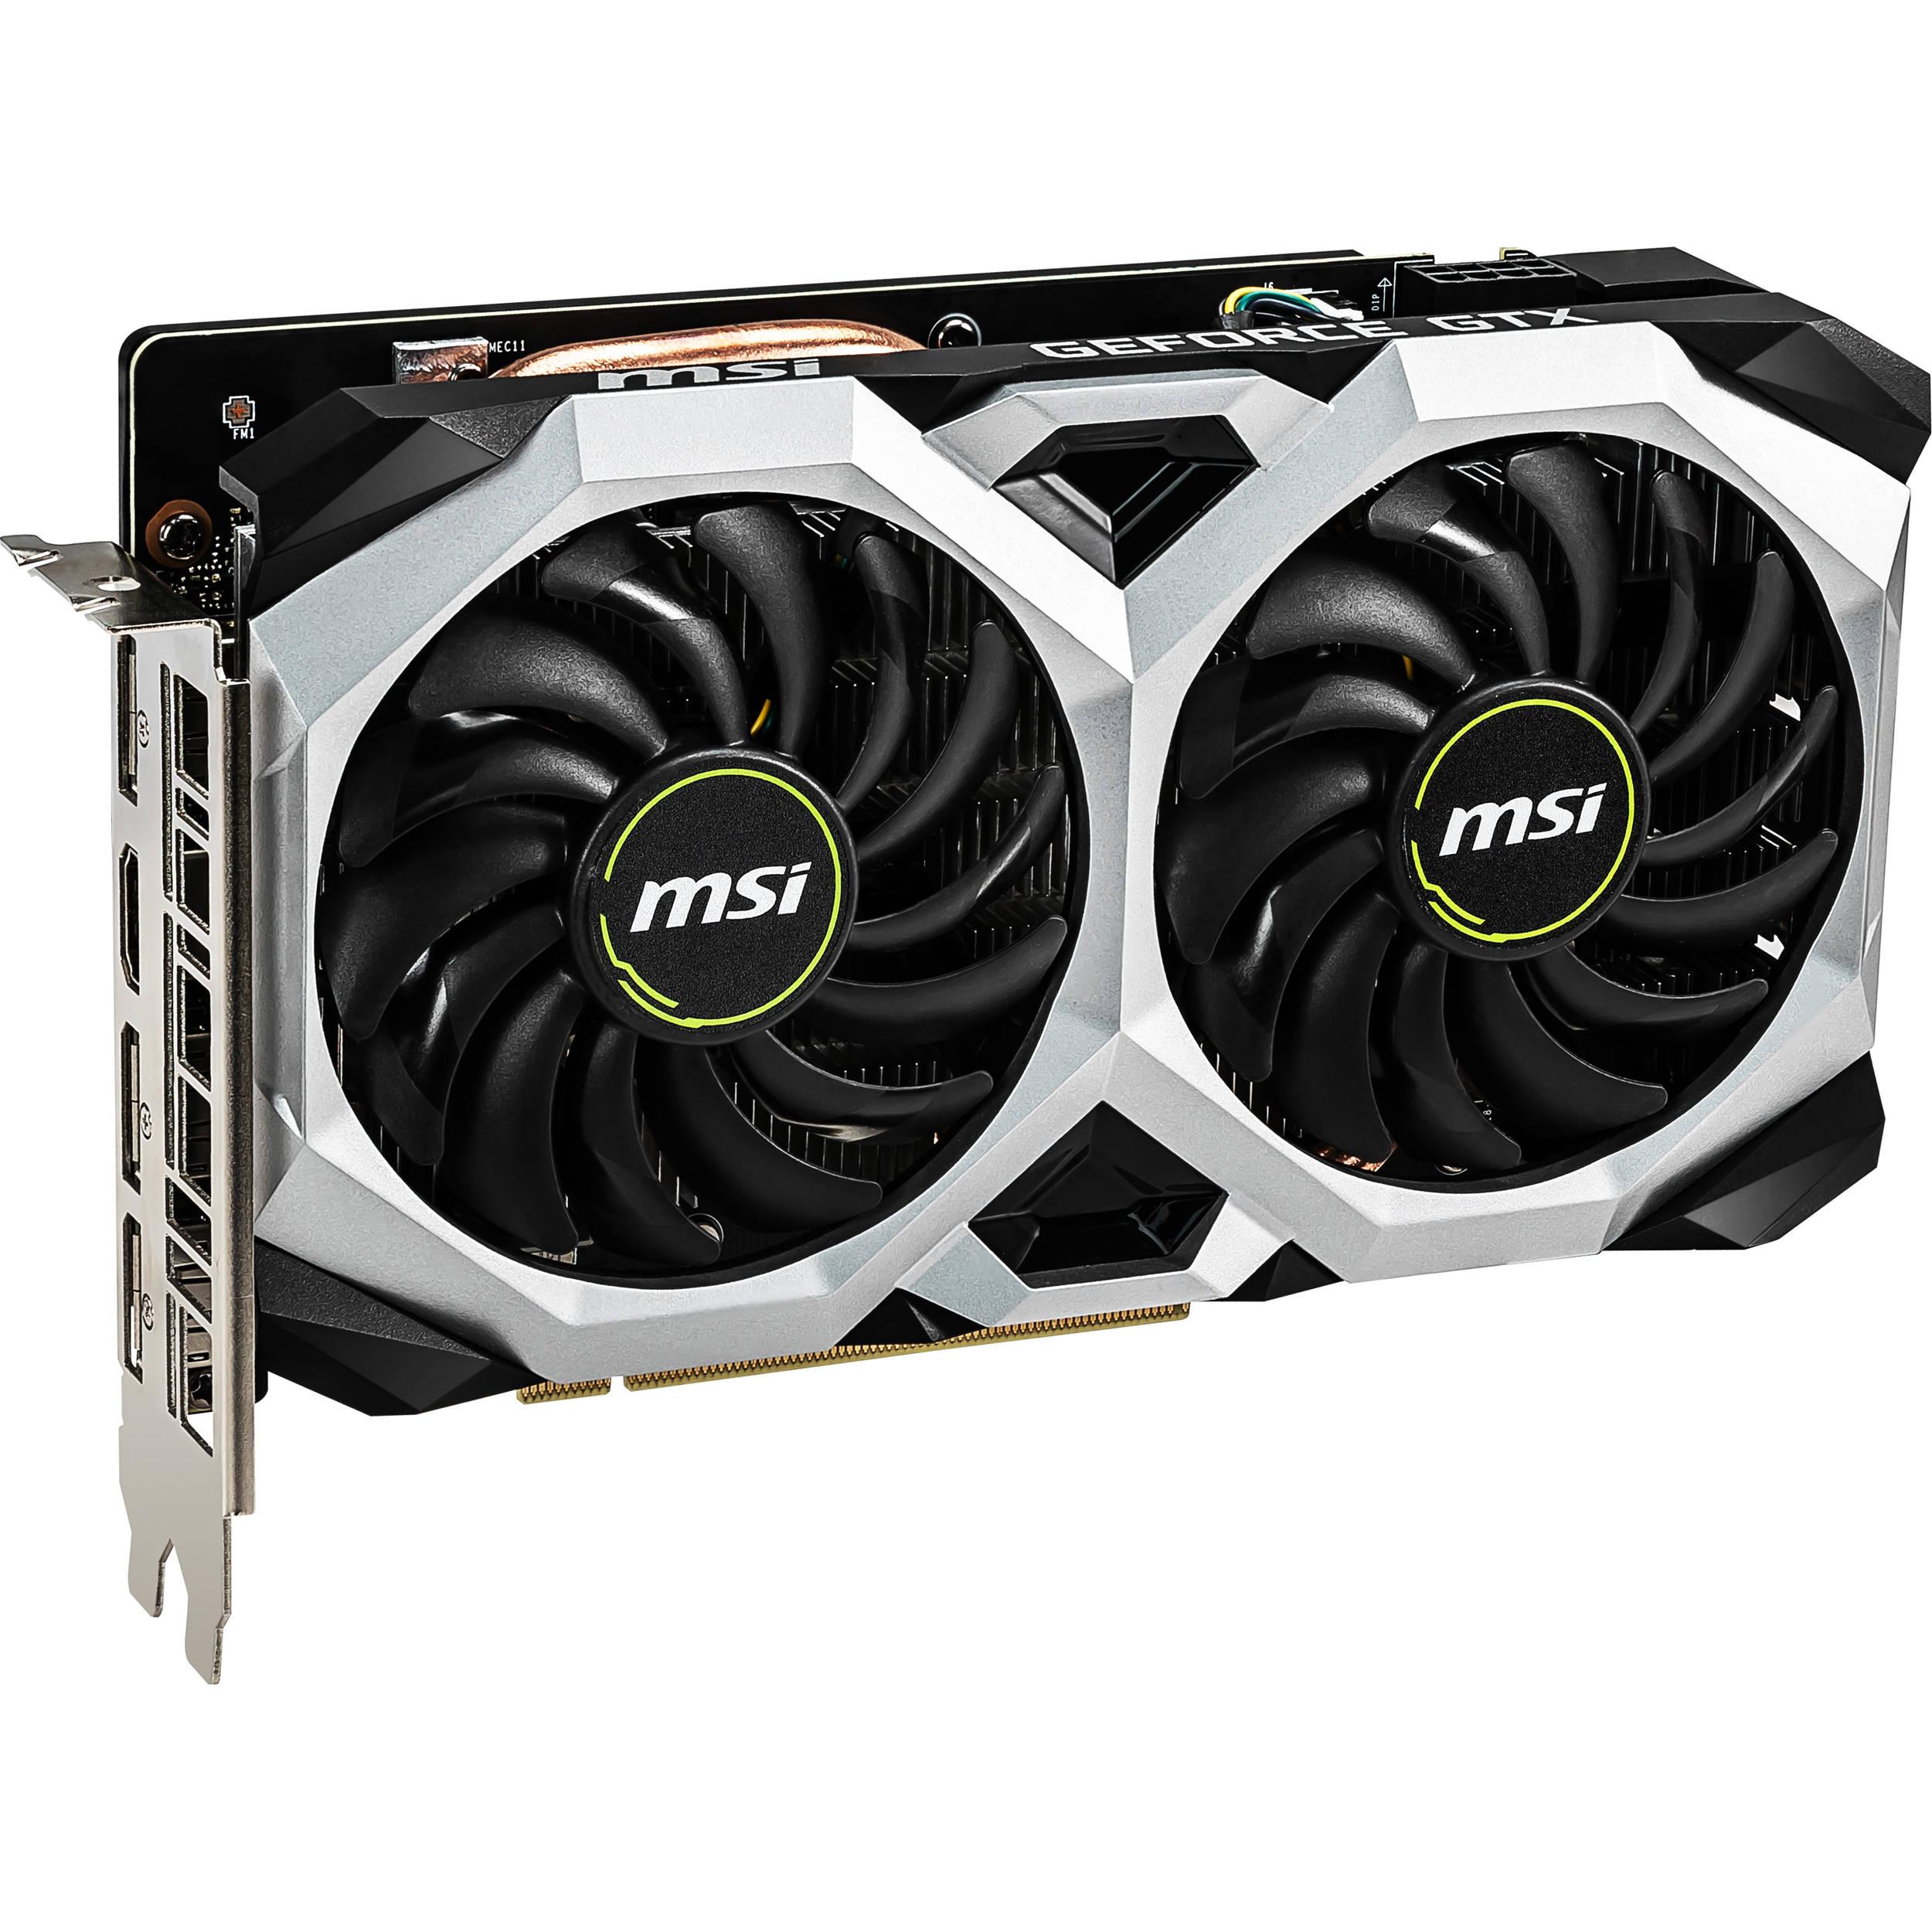 MSI GeForce GTX 1660 Ti VENTUS XS OC Graphics Card